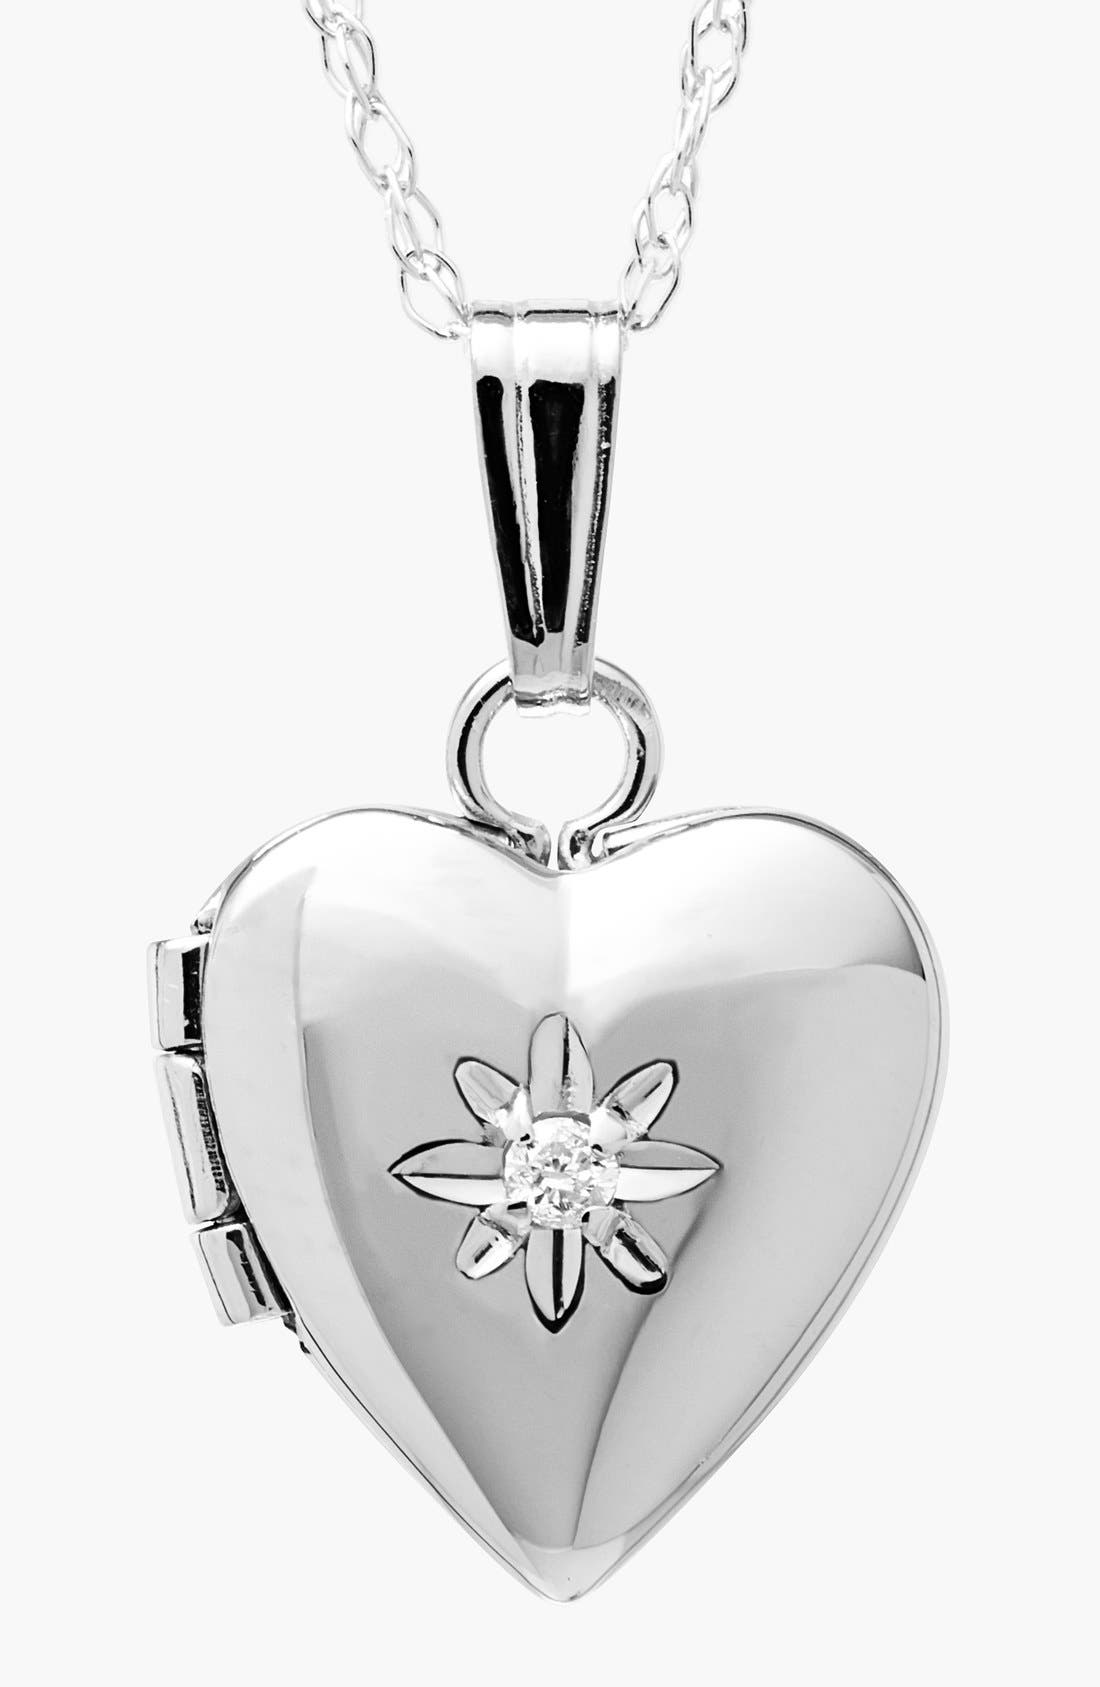 14k White Gold Heart Locket Necklace,                             Main thumbnail 1, color,                             White Gold